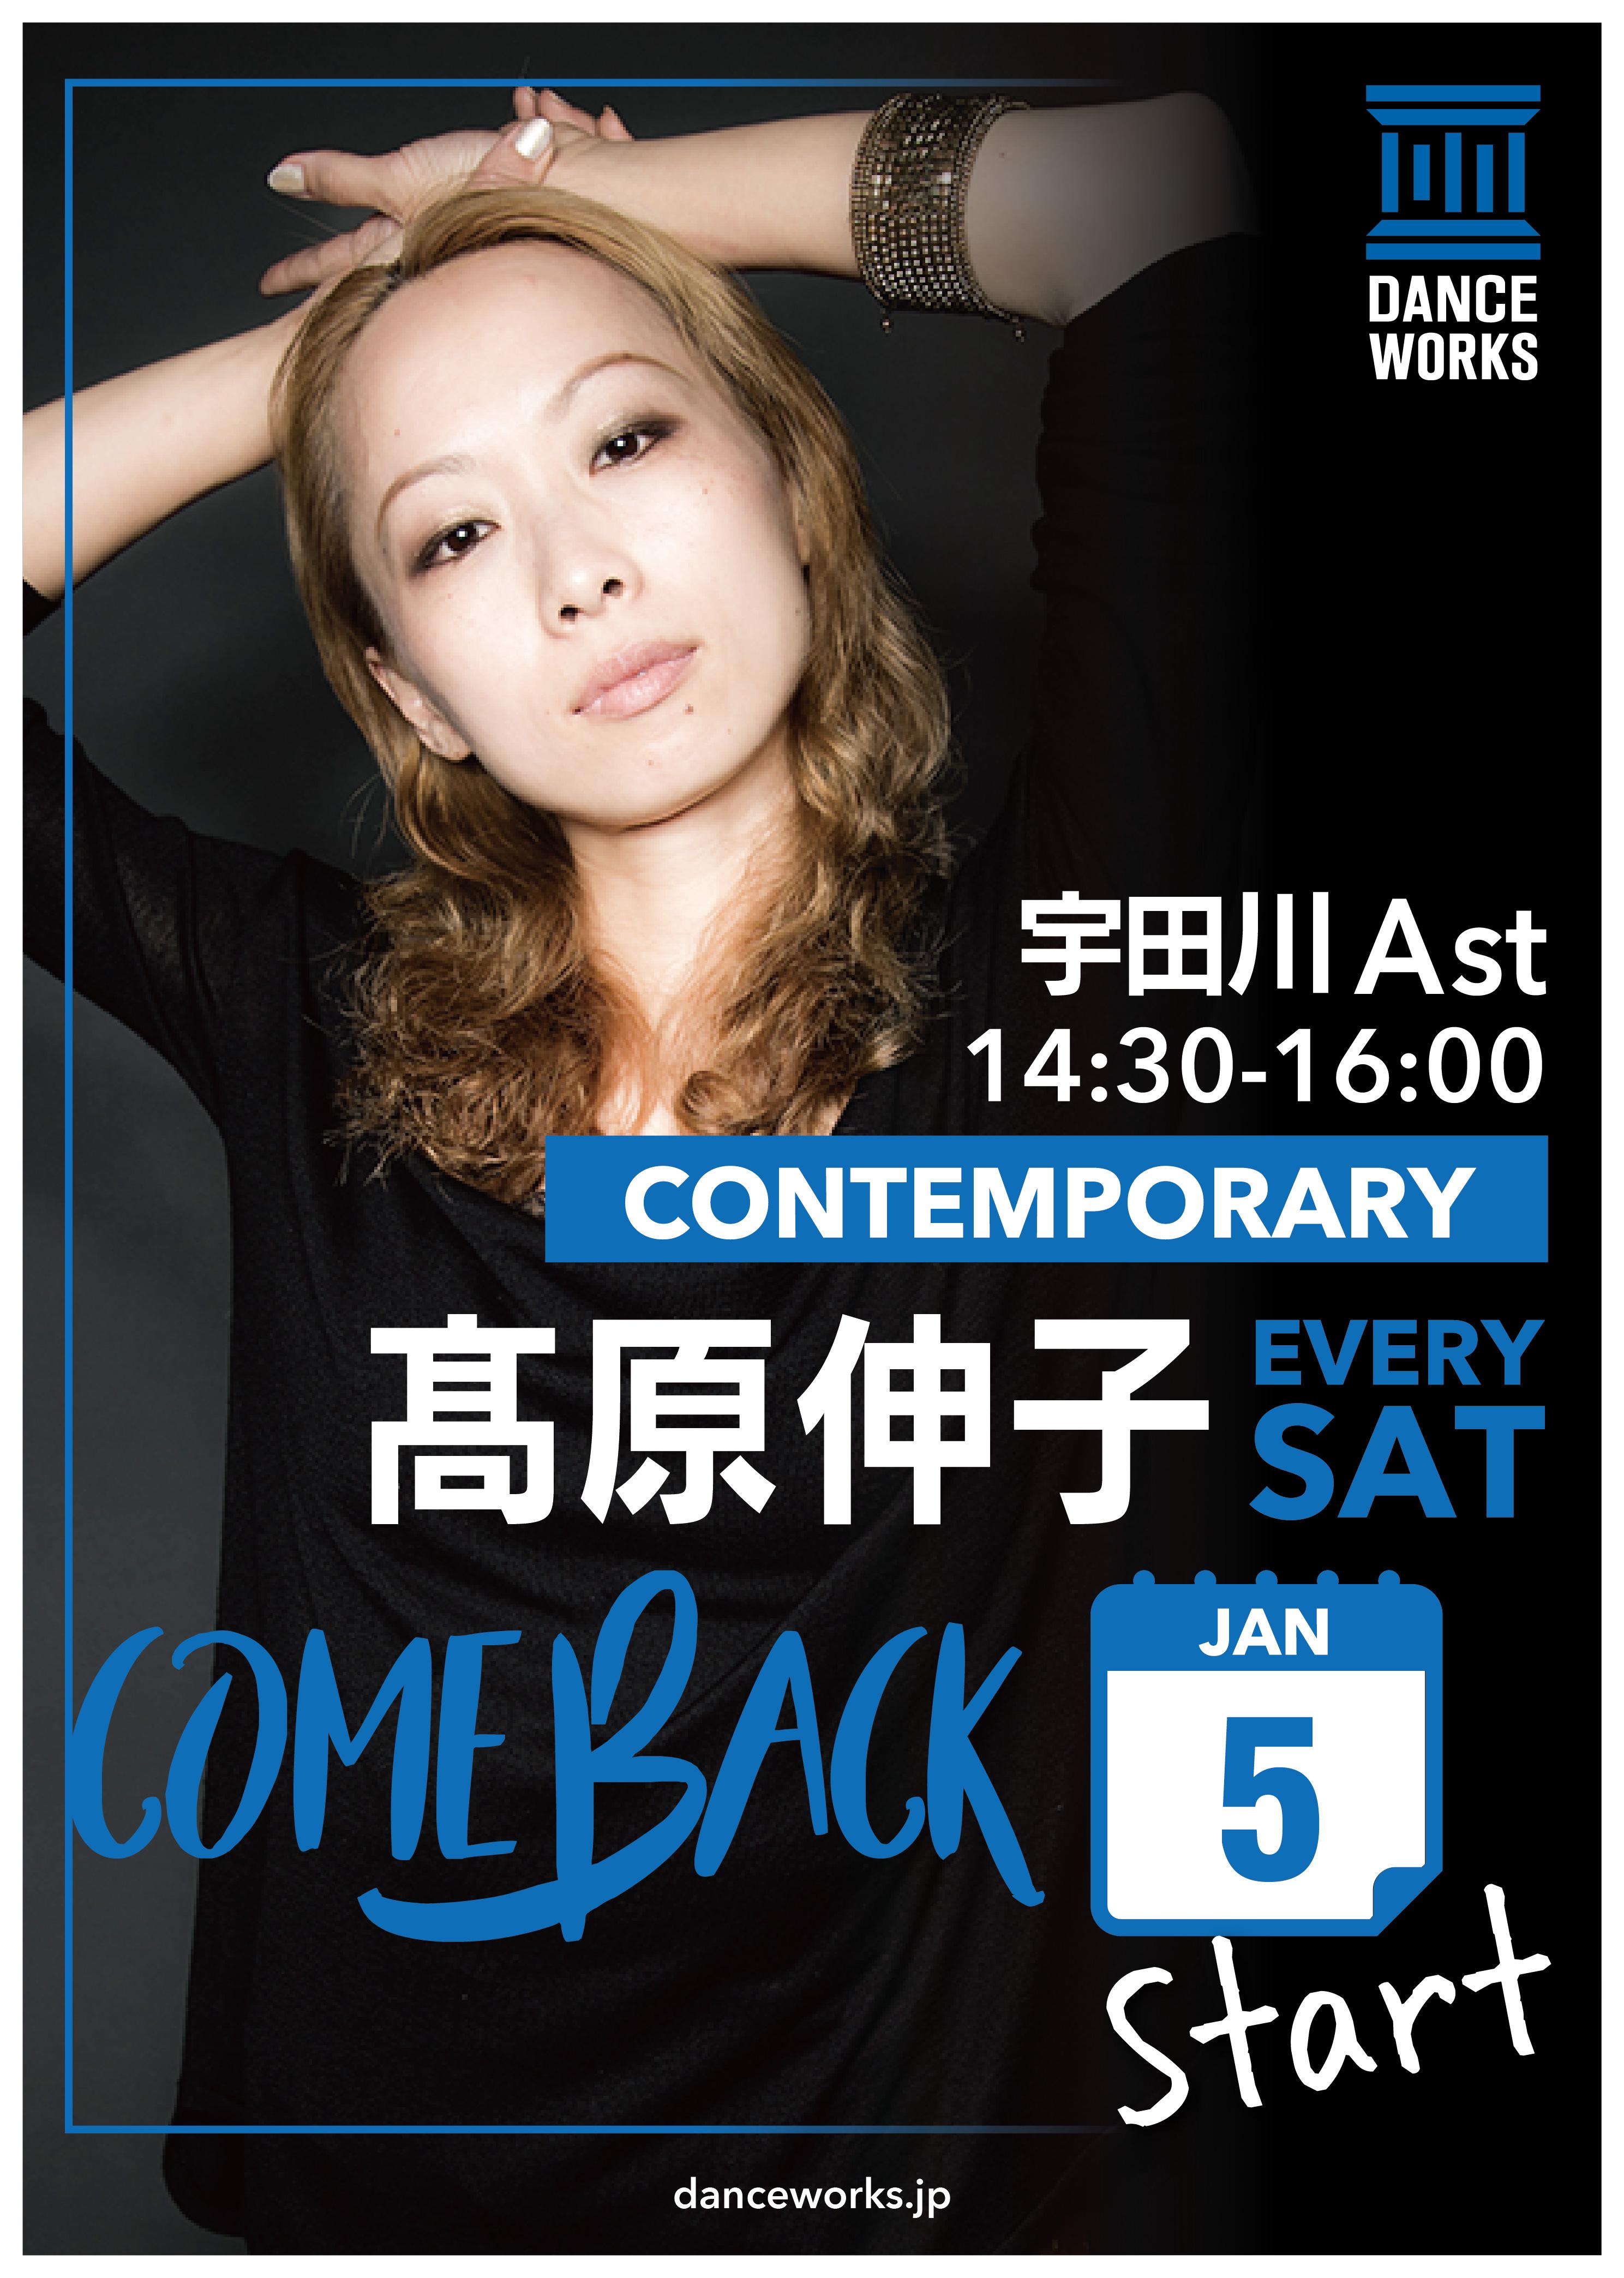 18.11_W_高原伸子BACK_アートボード 1